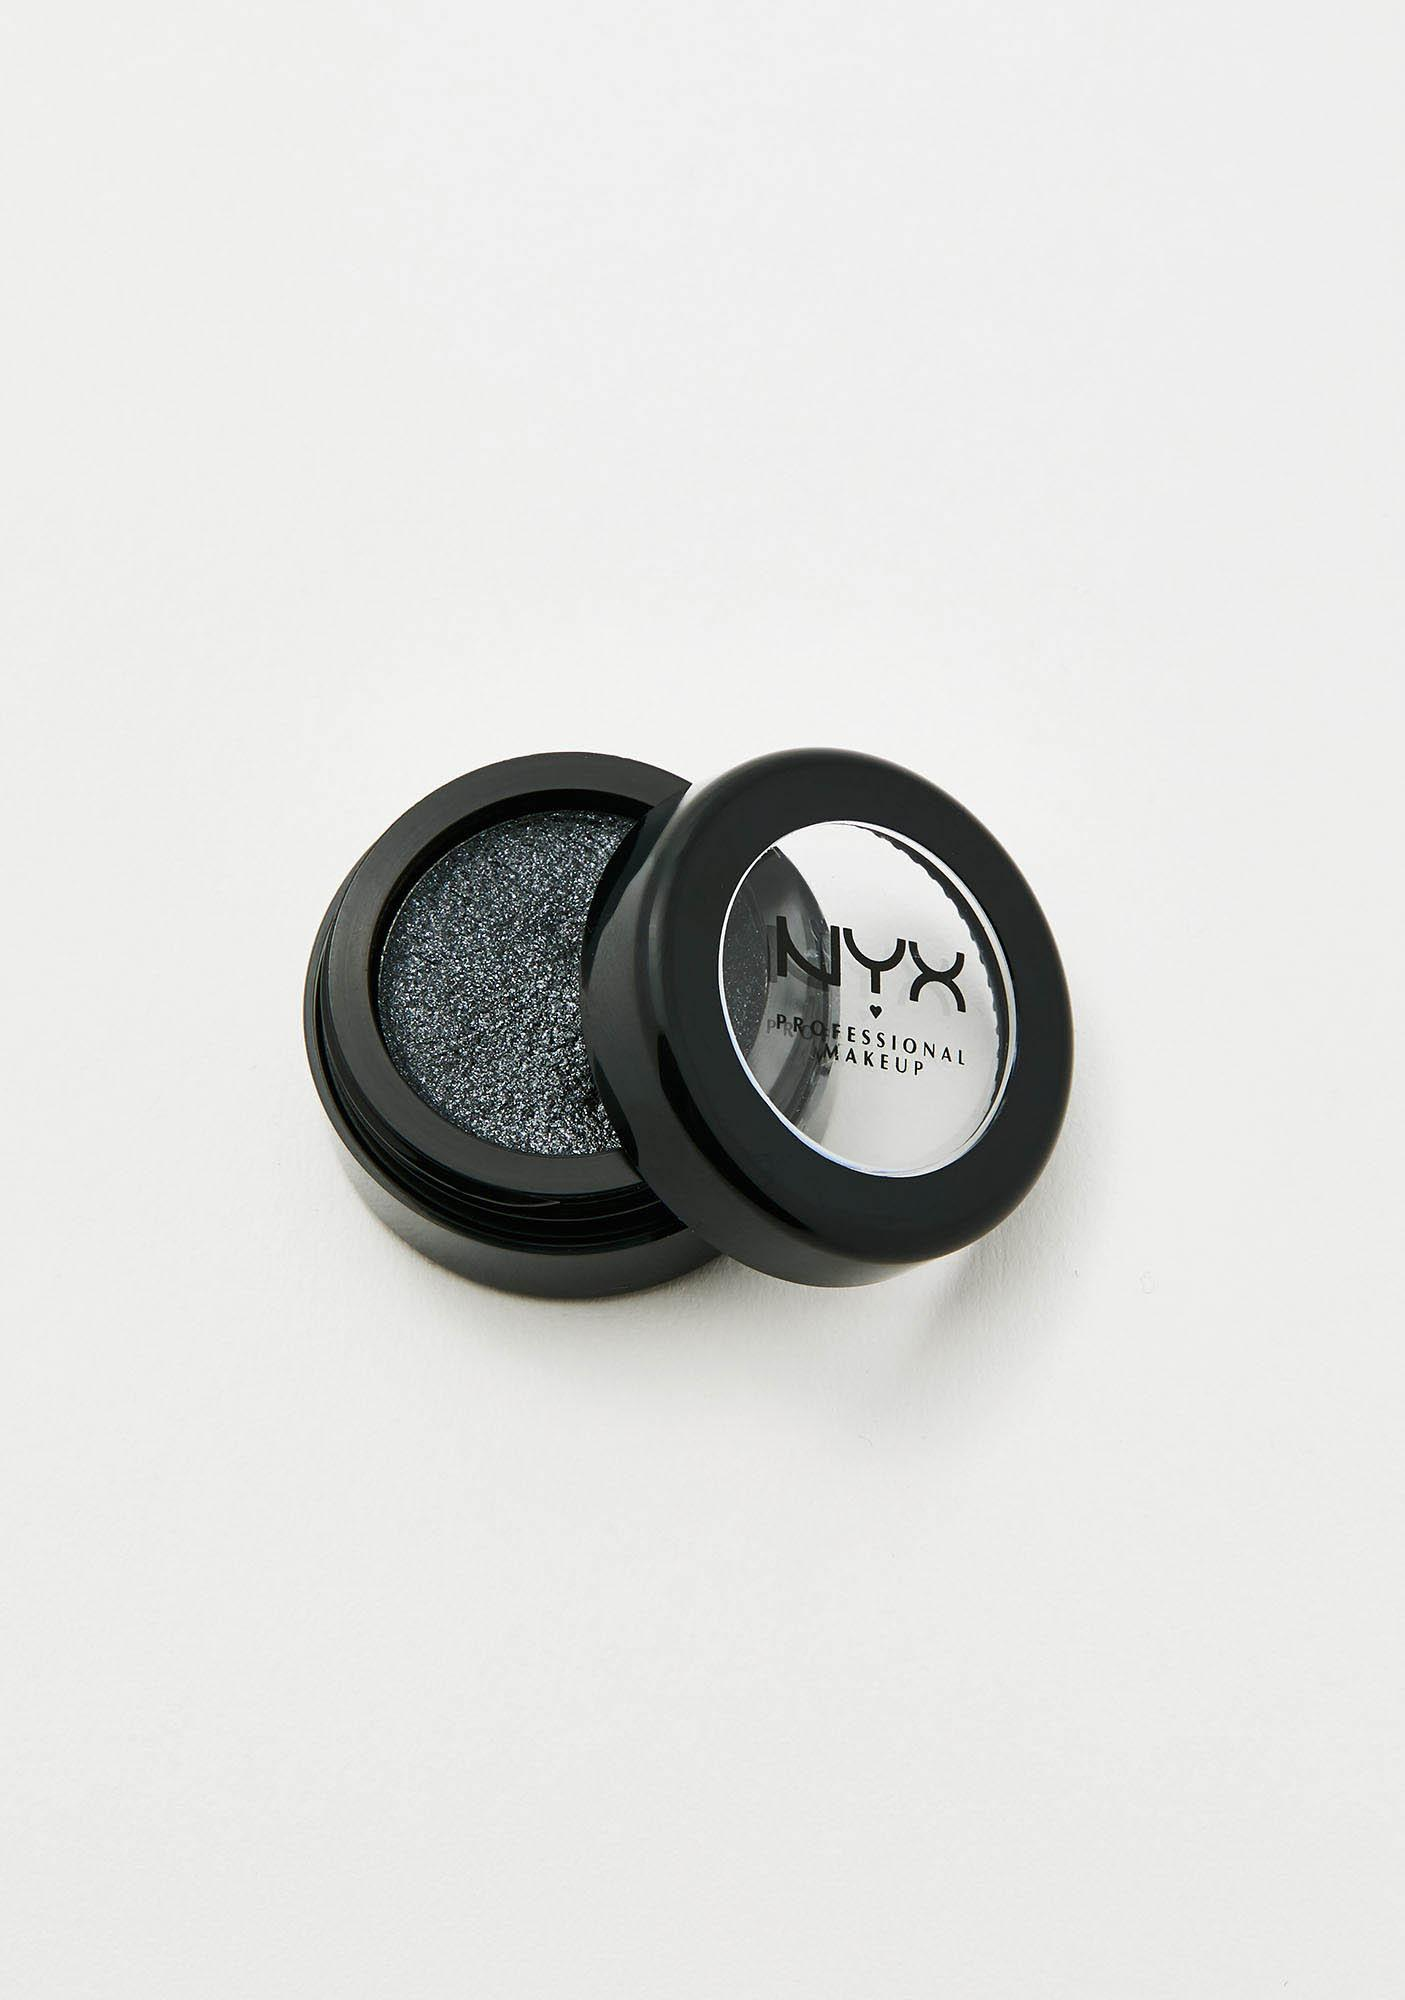 NYX Professional Makeup Black Knight Foil Play Cream Eyeshadow